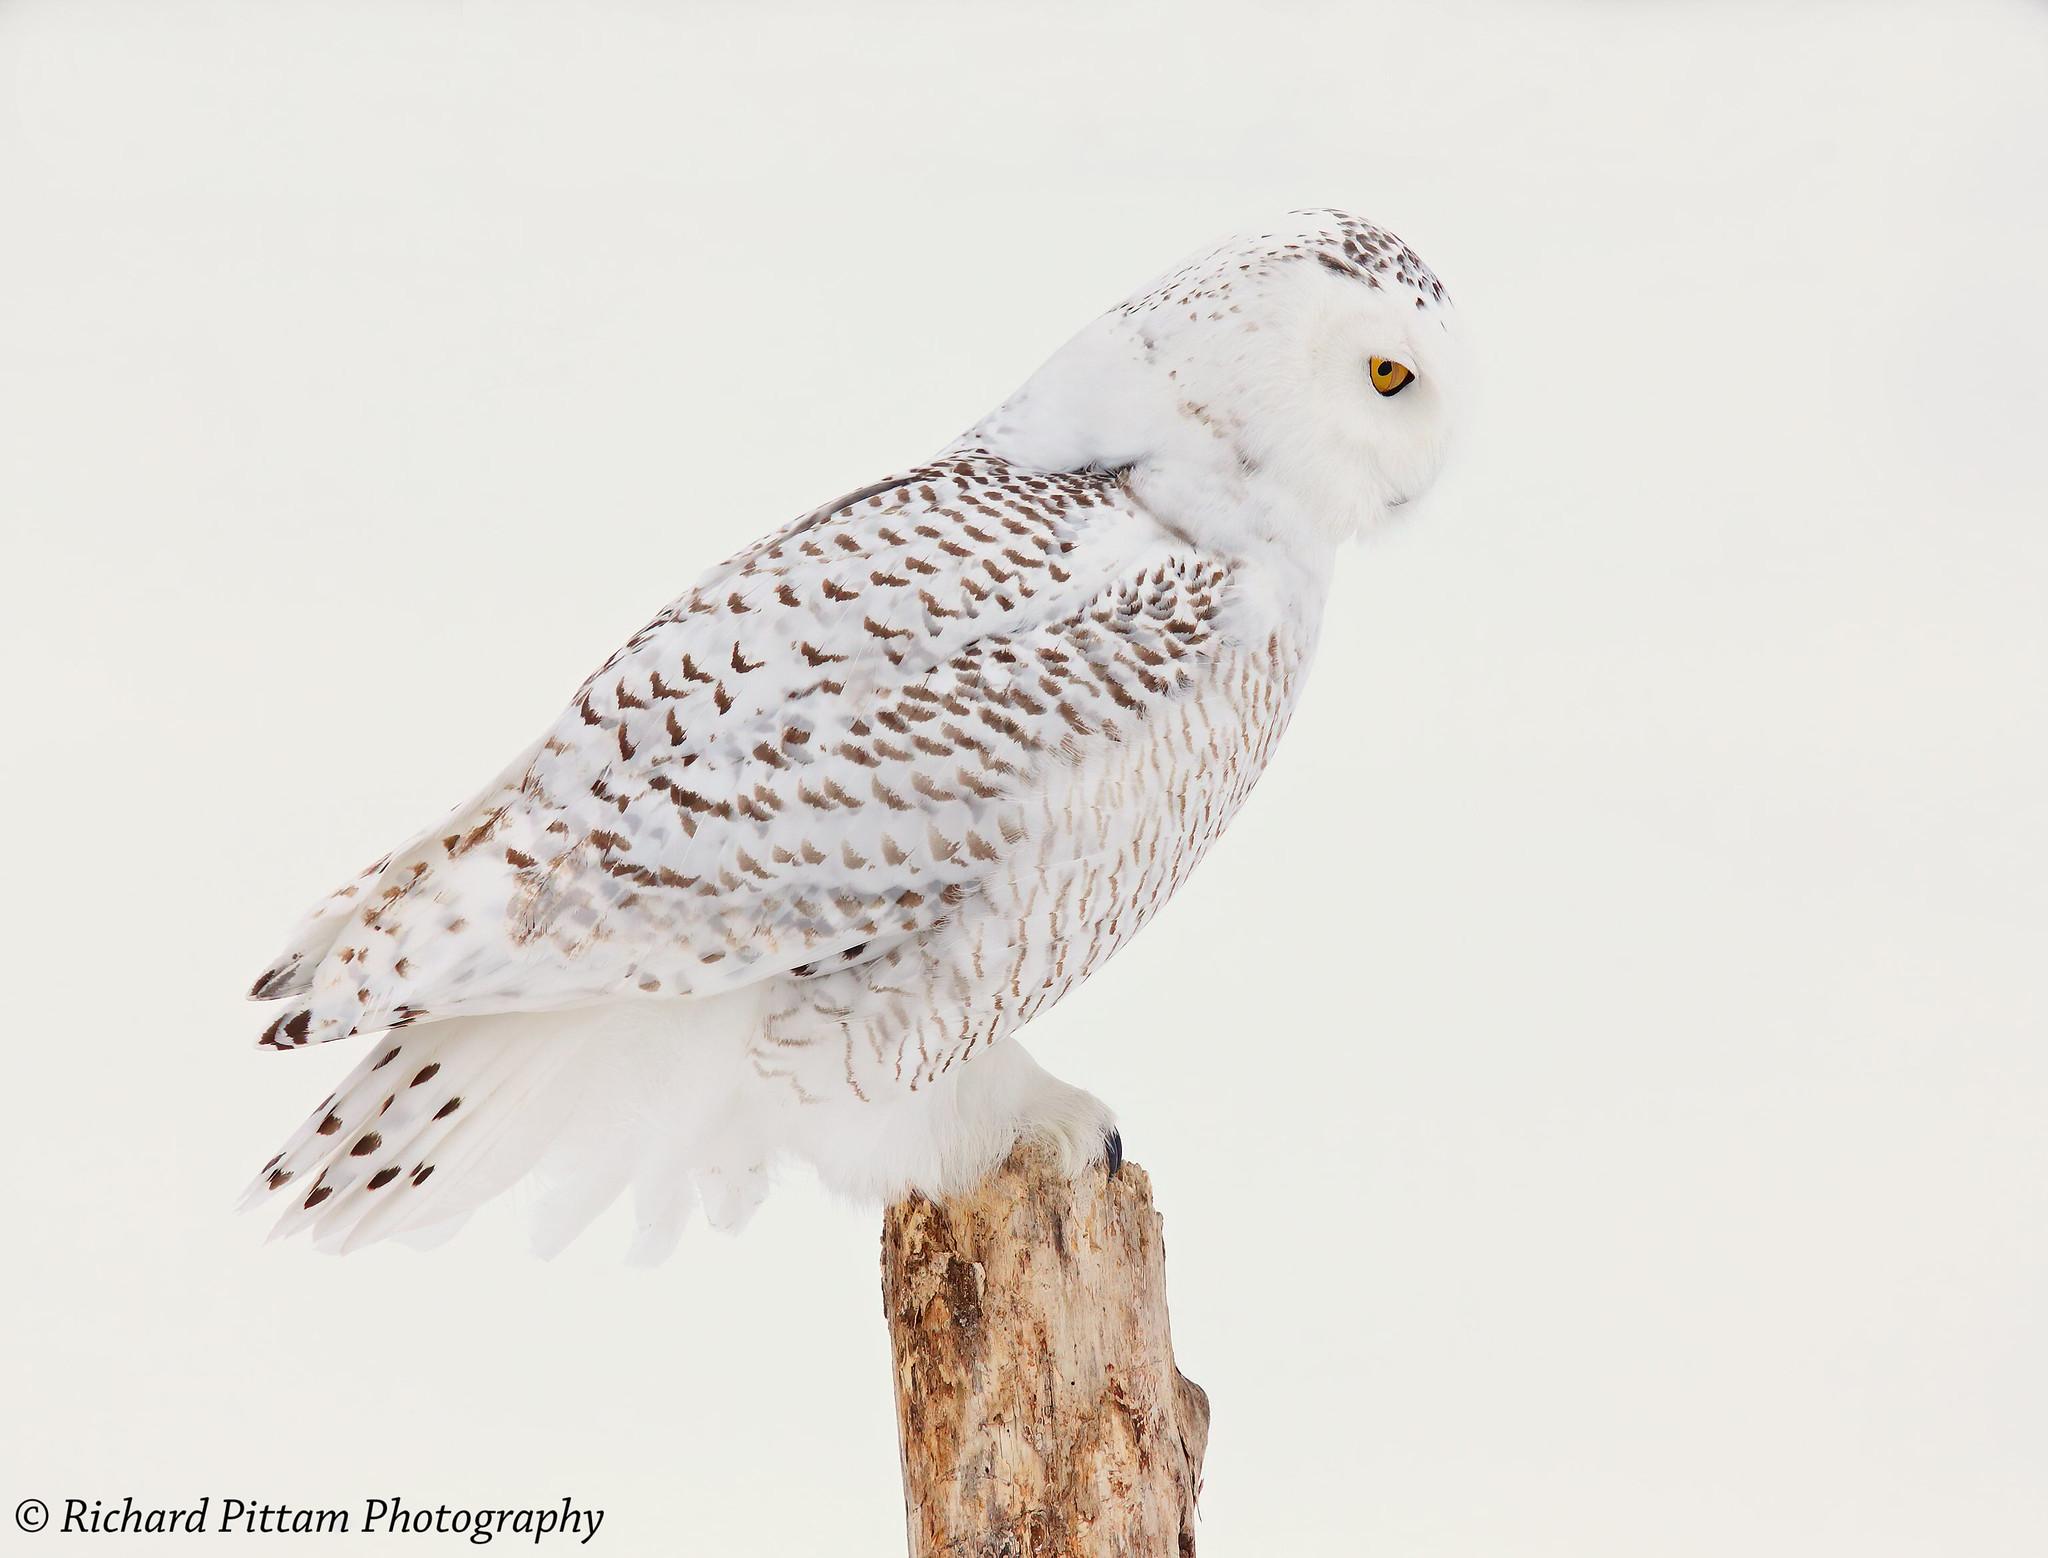 2014 shots re-processed - Snowy Owl, Ottawa